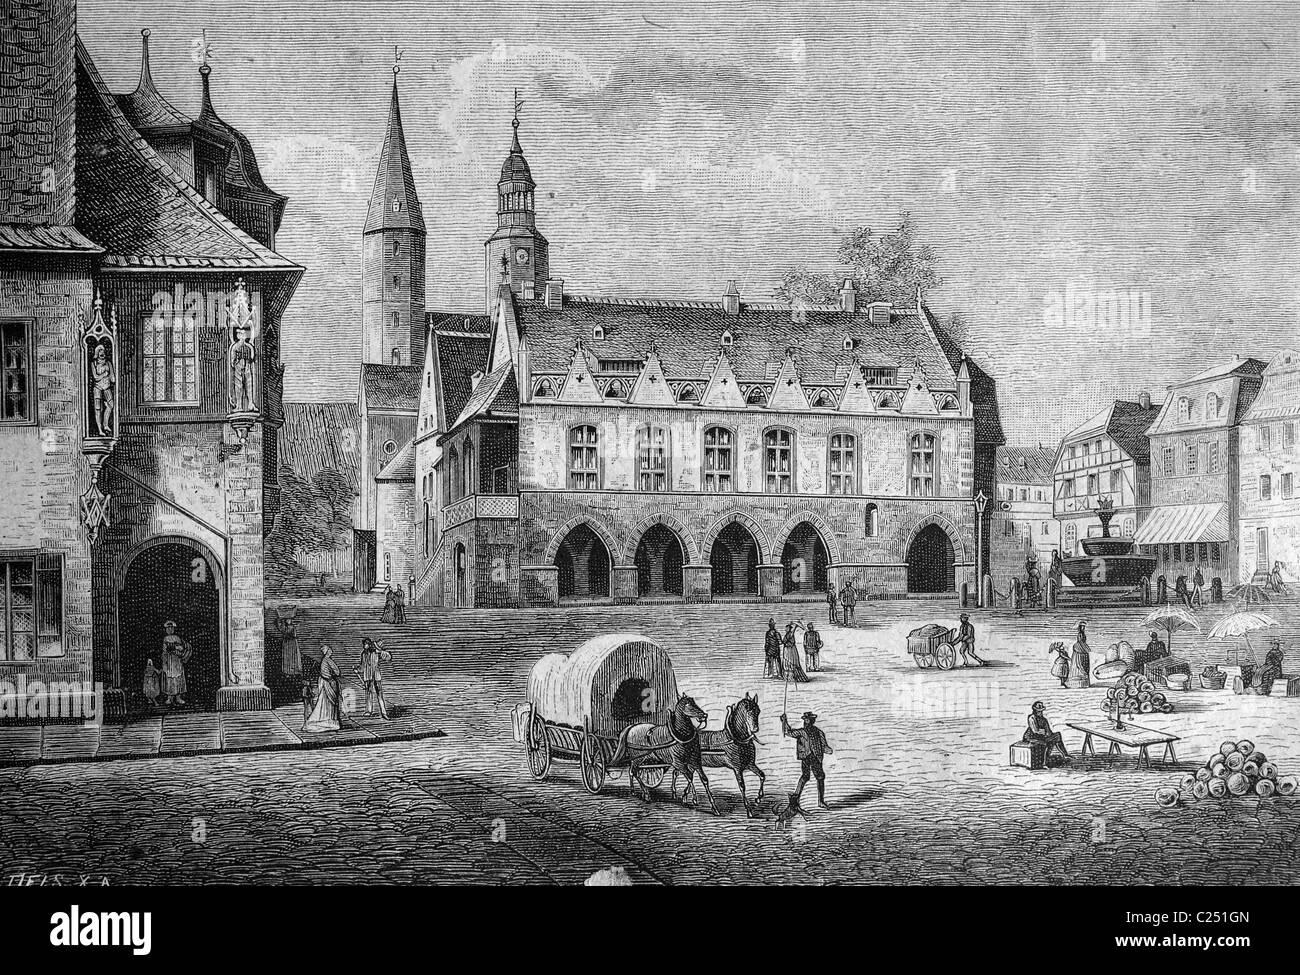 Town hall in Goslar, Germany, historic illustration, 1877 - Stock Image